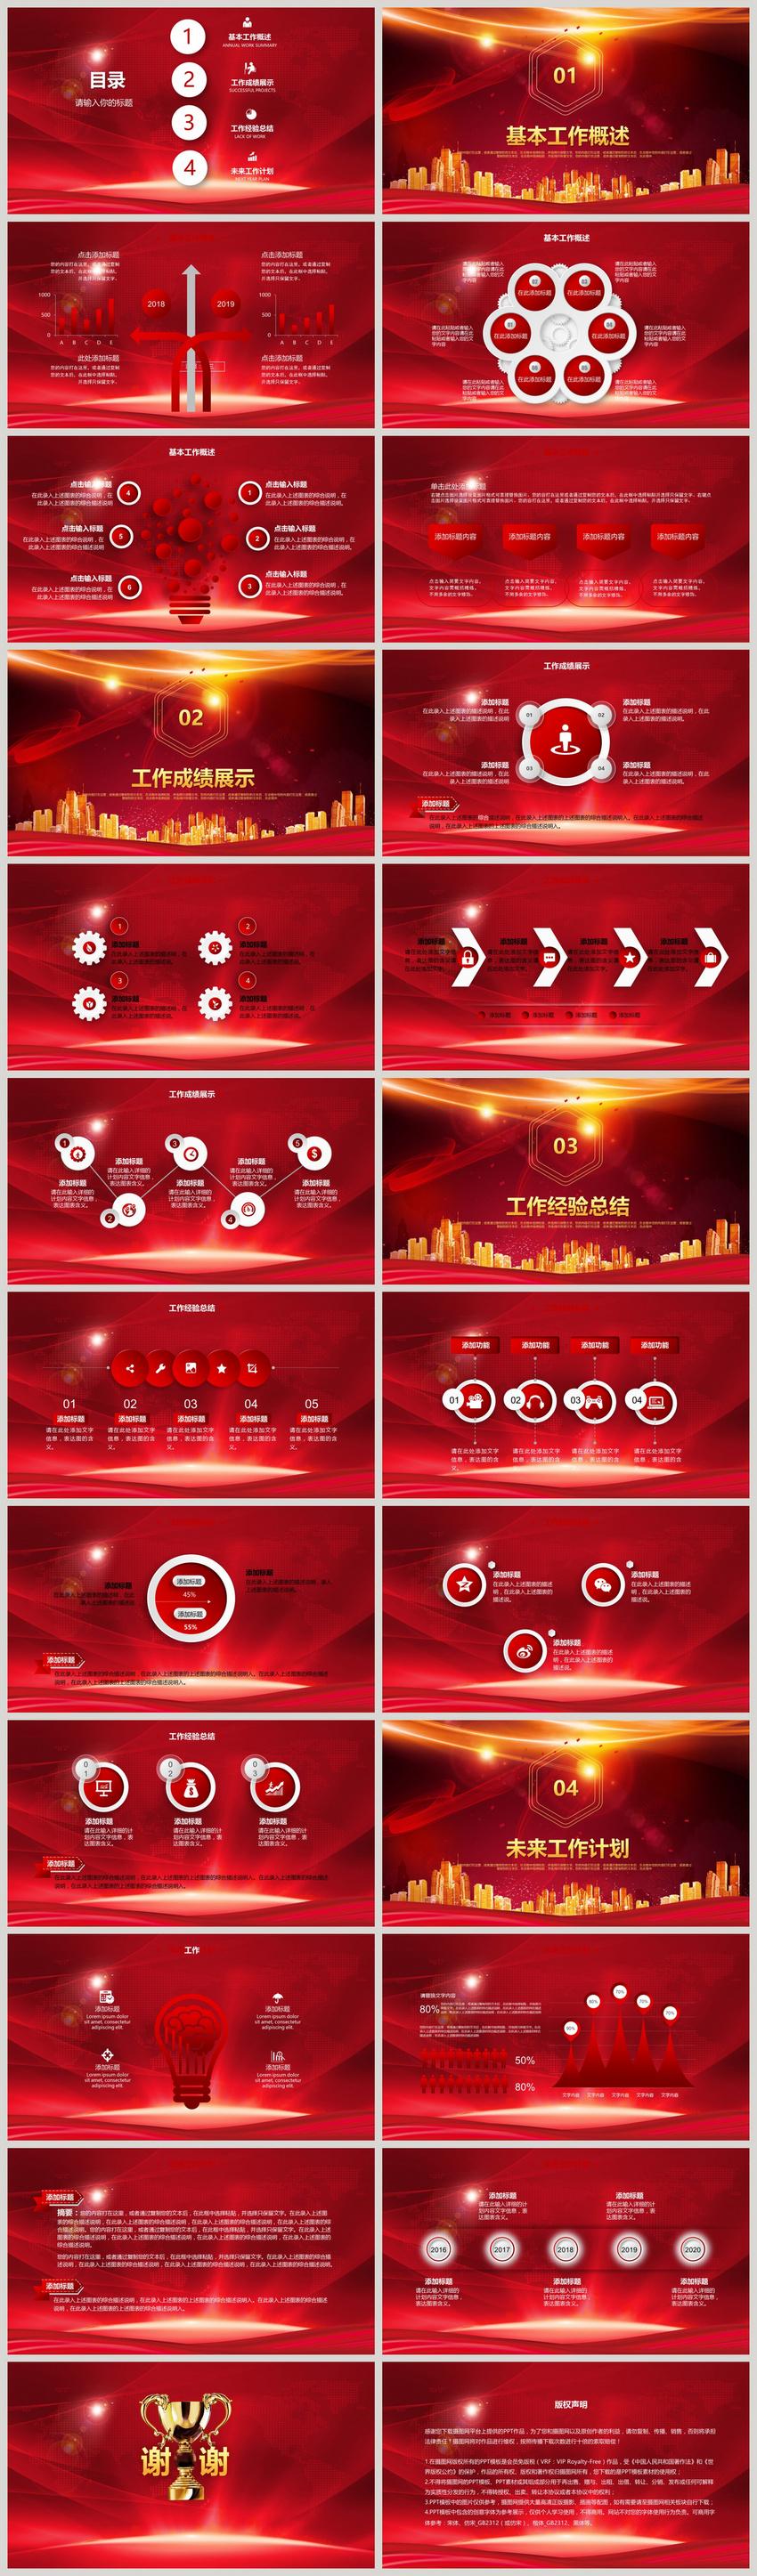 the elegant red enterprise annual meeting award ppt template